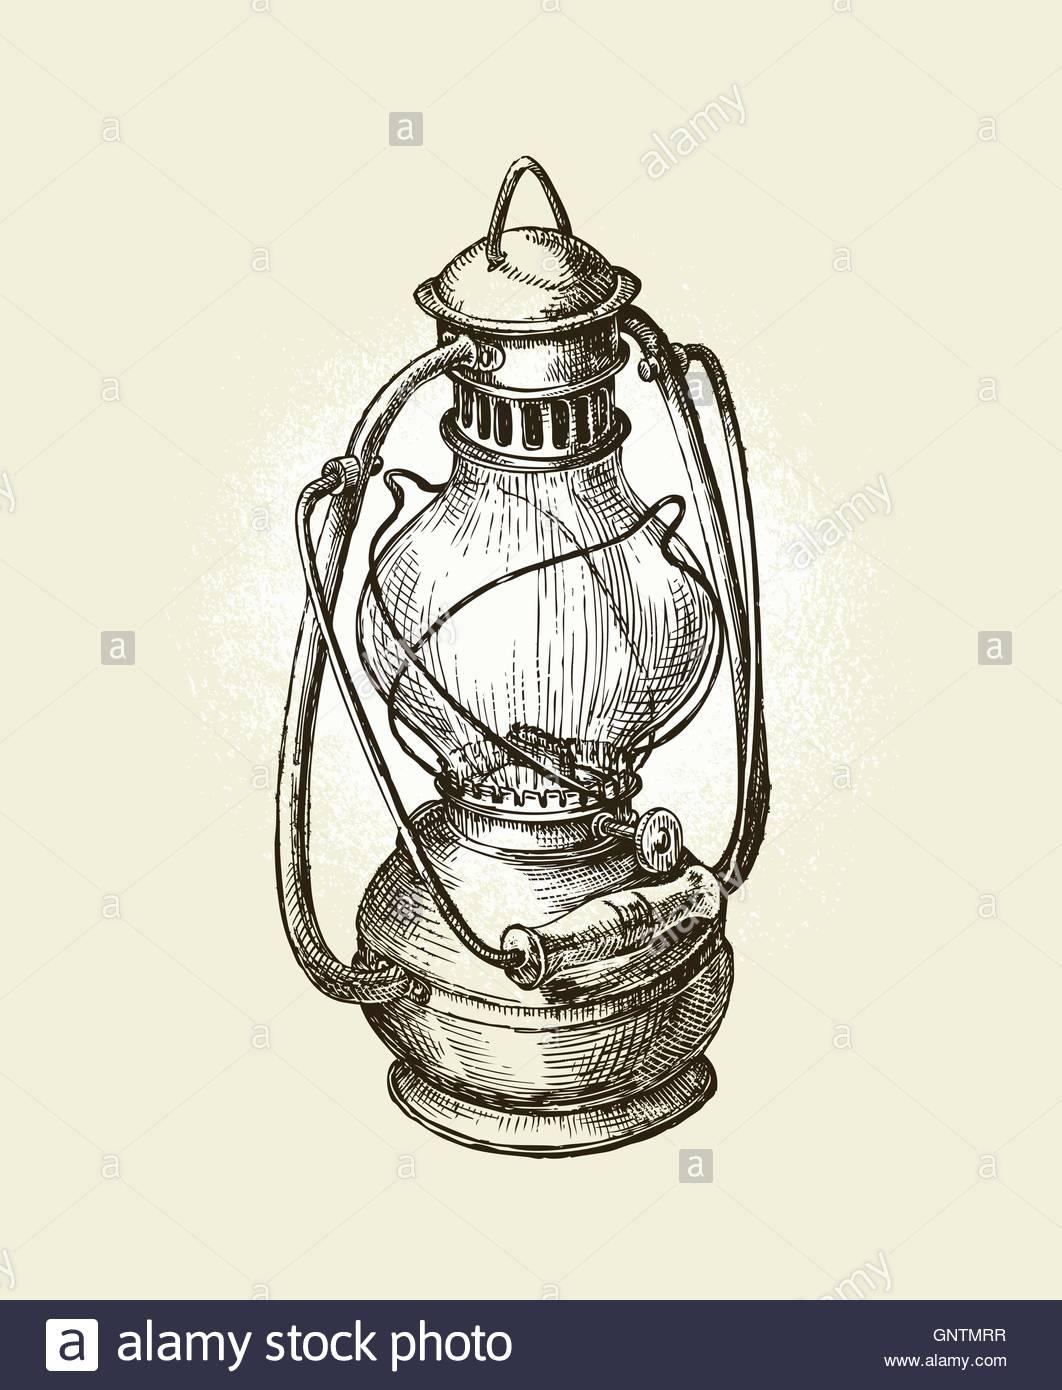 1062x1390 Hand Drawn Vintage Kerosene Lamp. Sketch Oil Vector Illustration